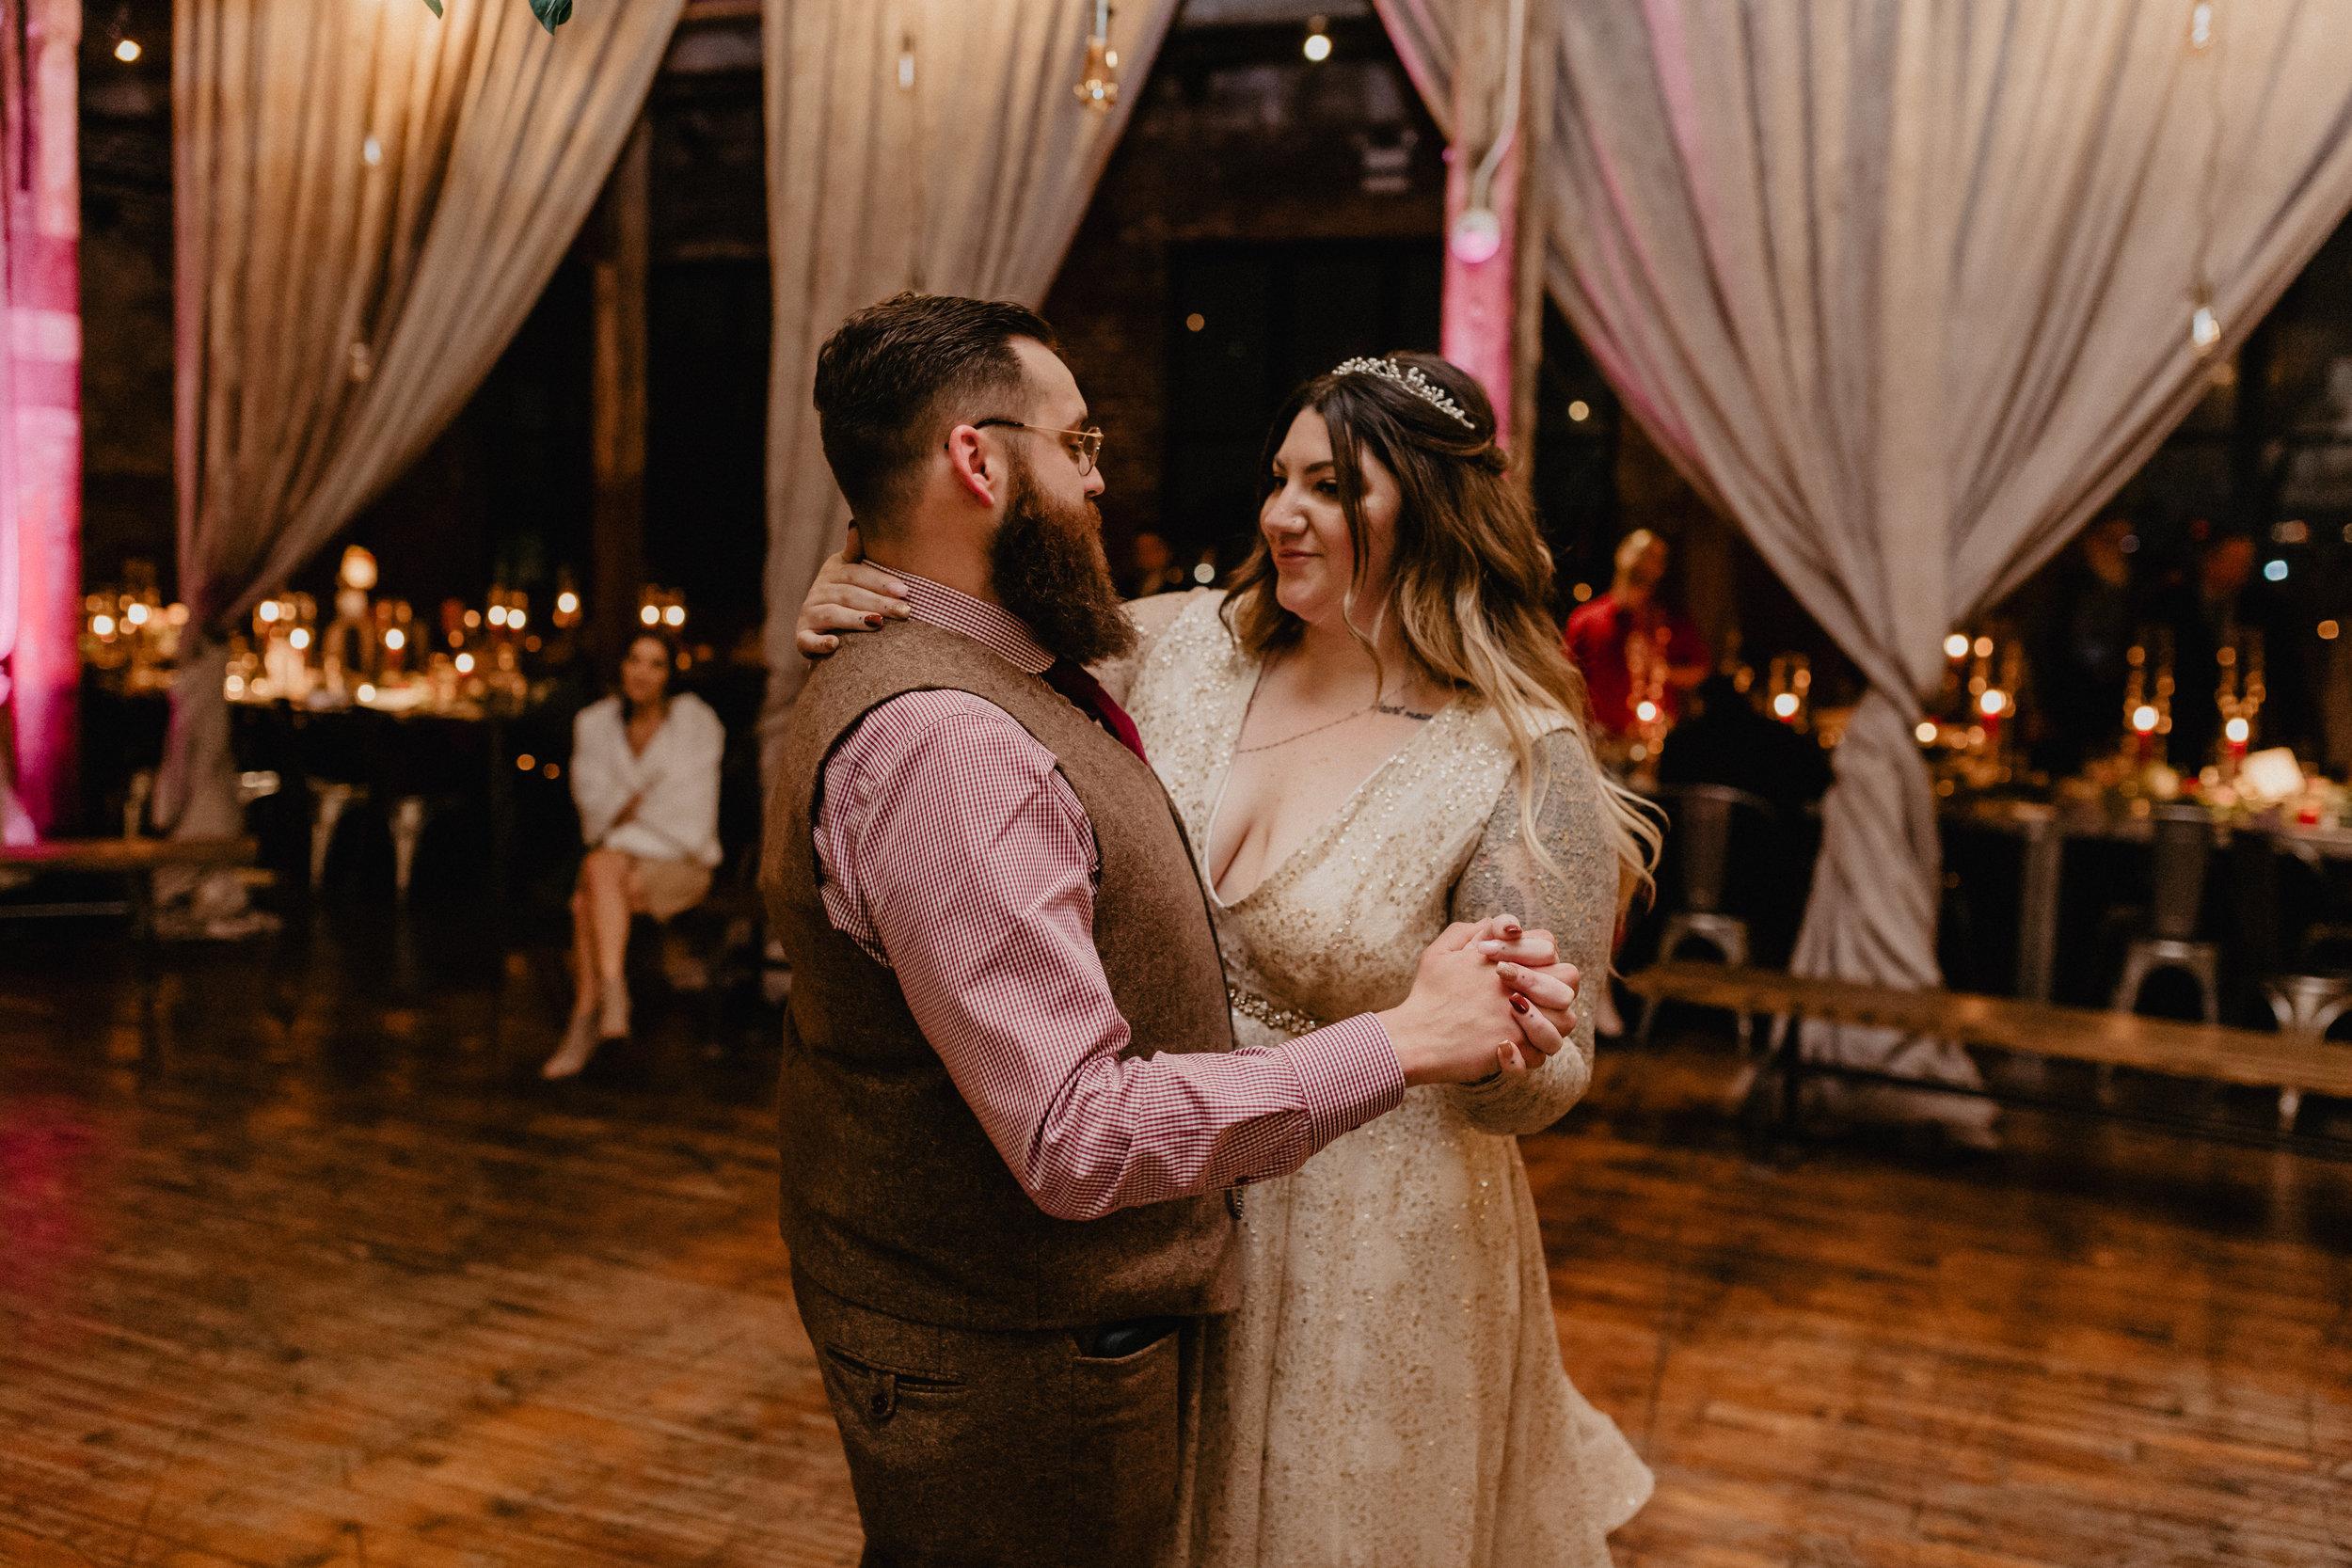 greenpoint_loft_wedding_127.jpg